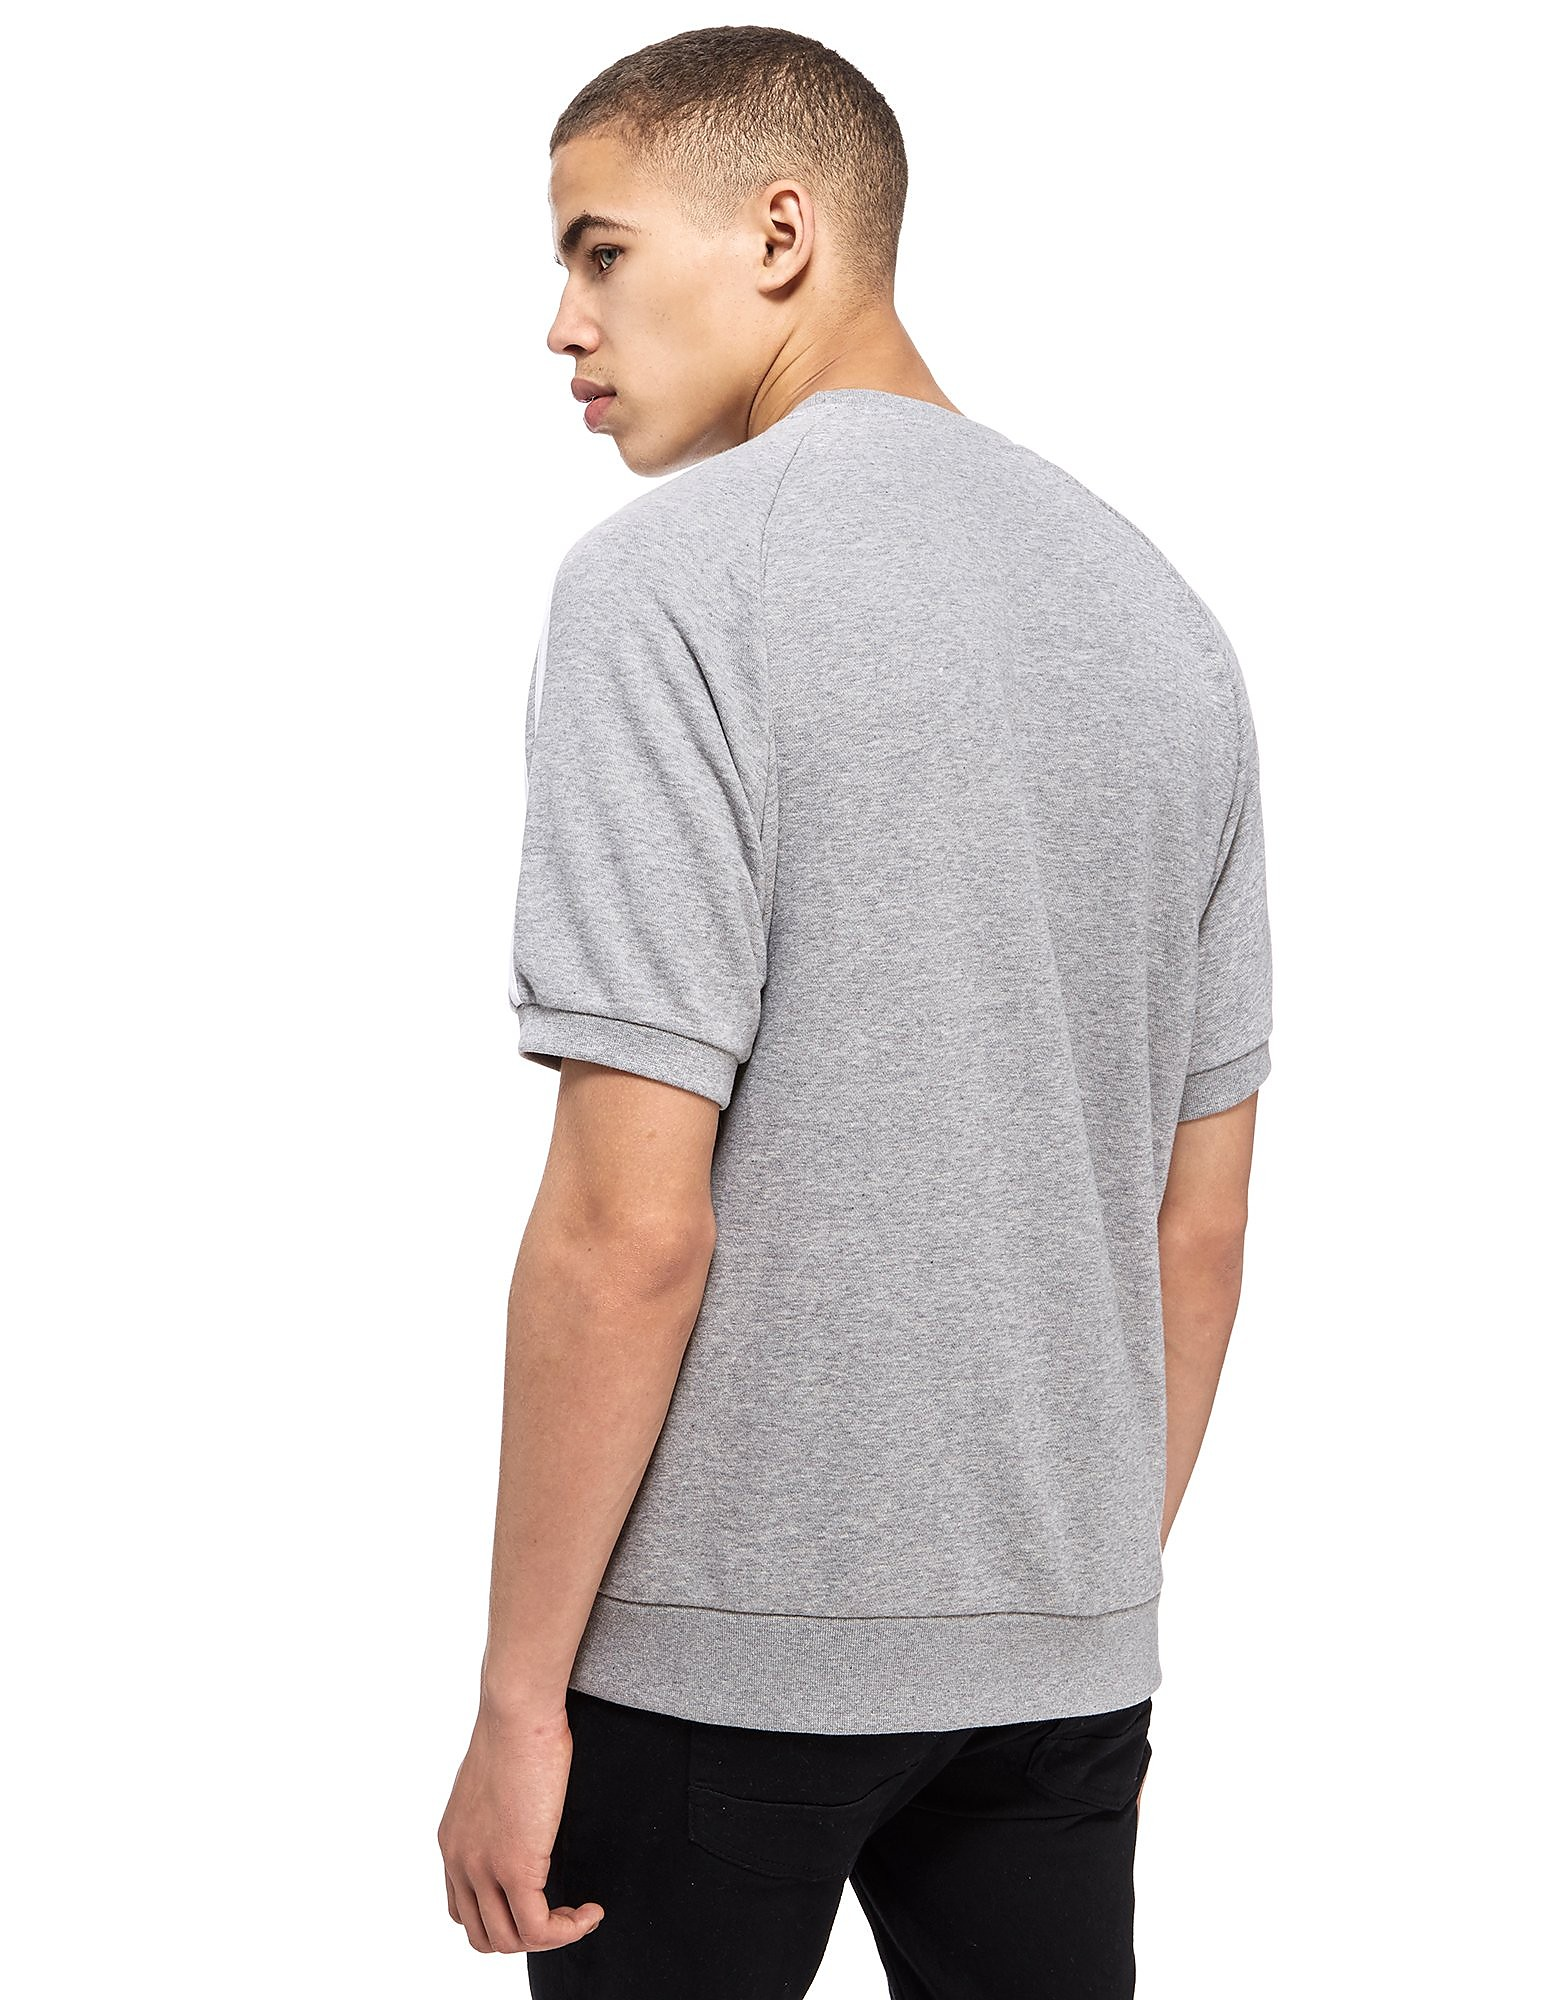 adidas Originals Sweatshirt California Short Sleeve Crew